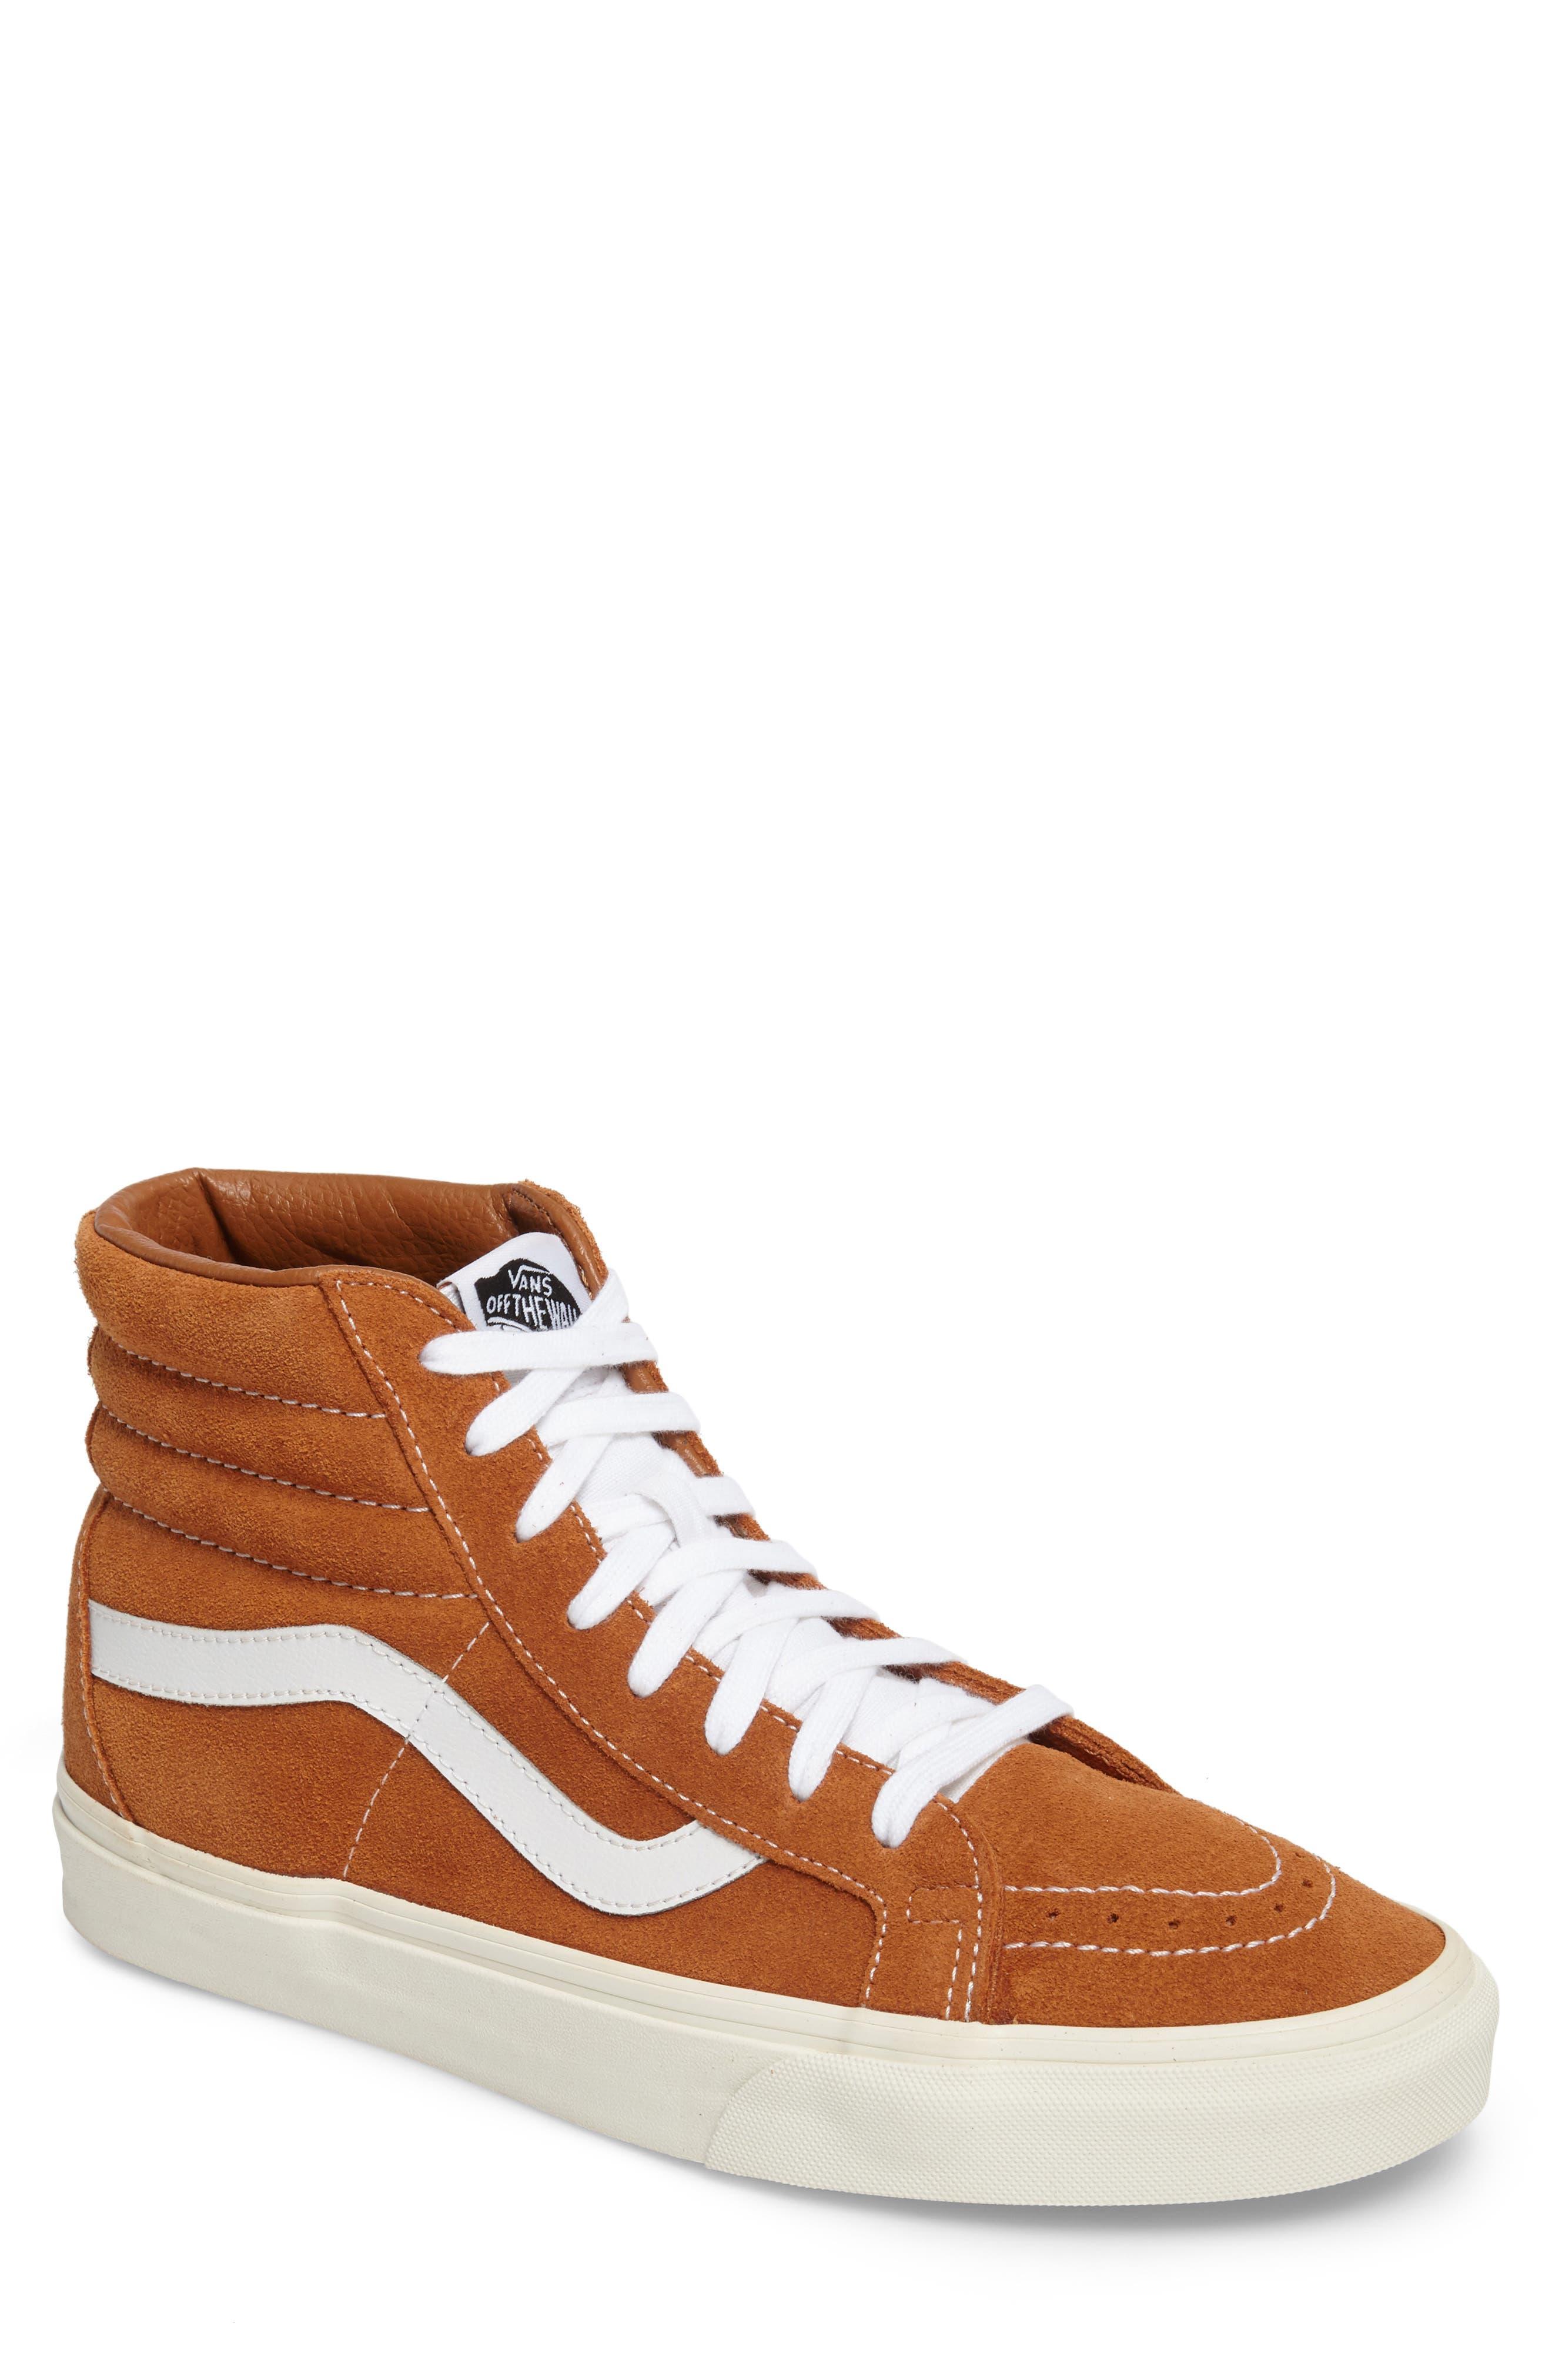 Main Image - Vans Sk8-Hi Reissue Sneaker (Men)